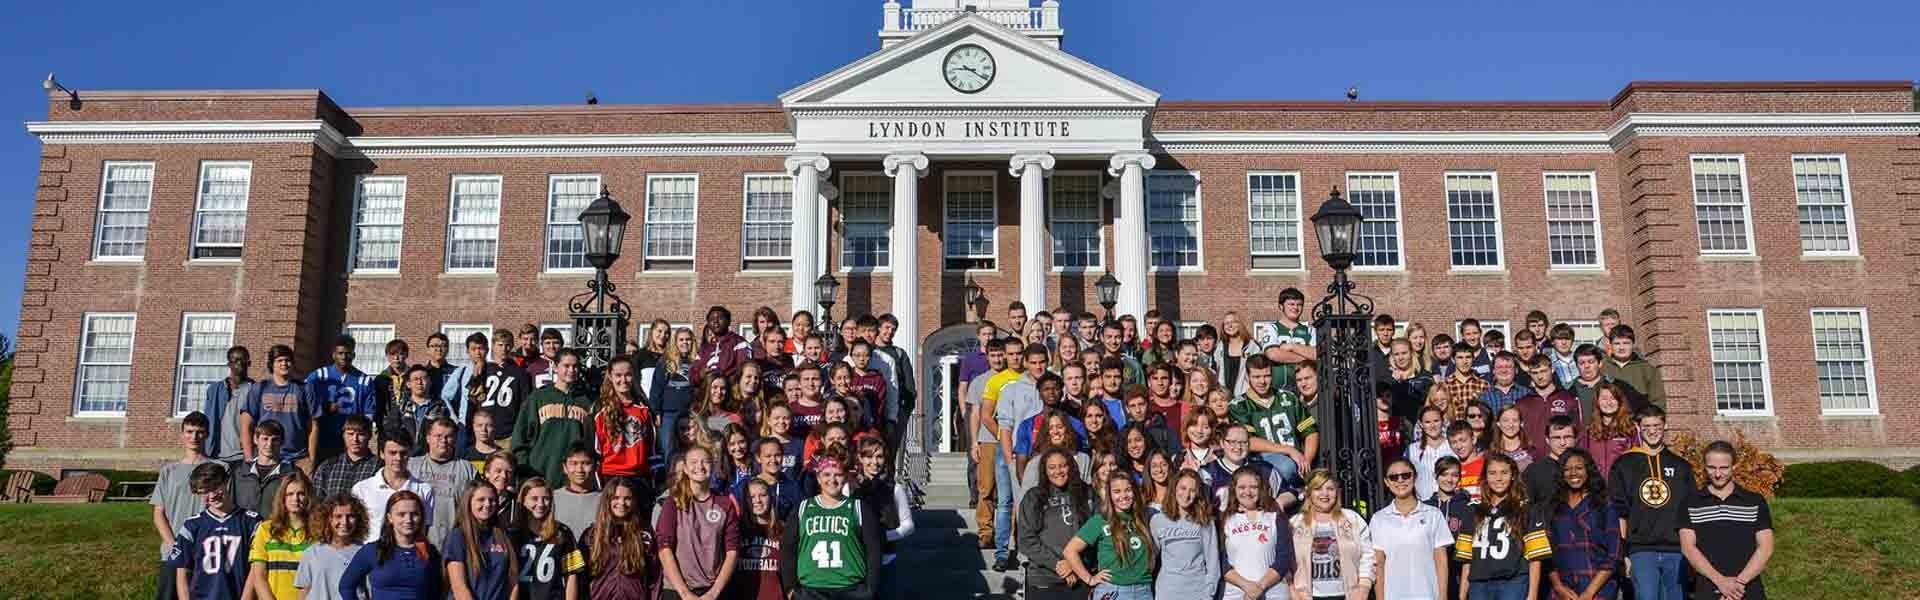 Lyndon Vermont USA Seniors Banner 2019